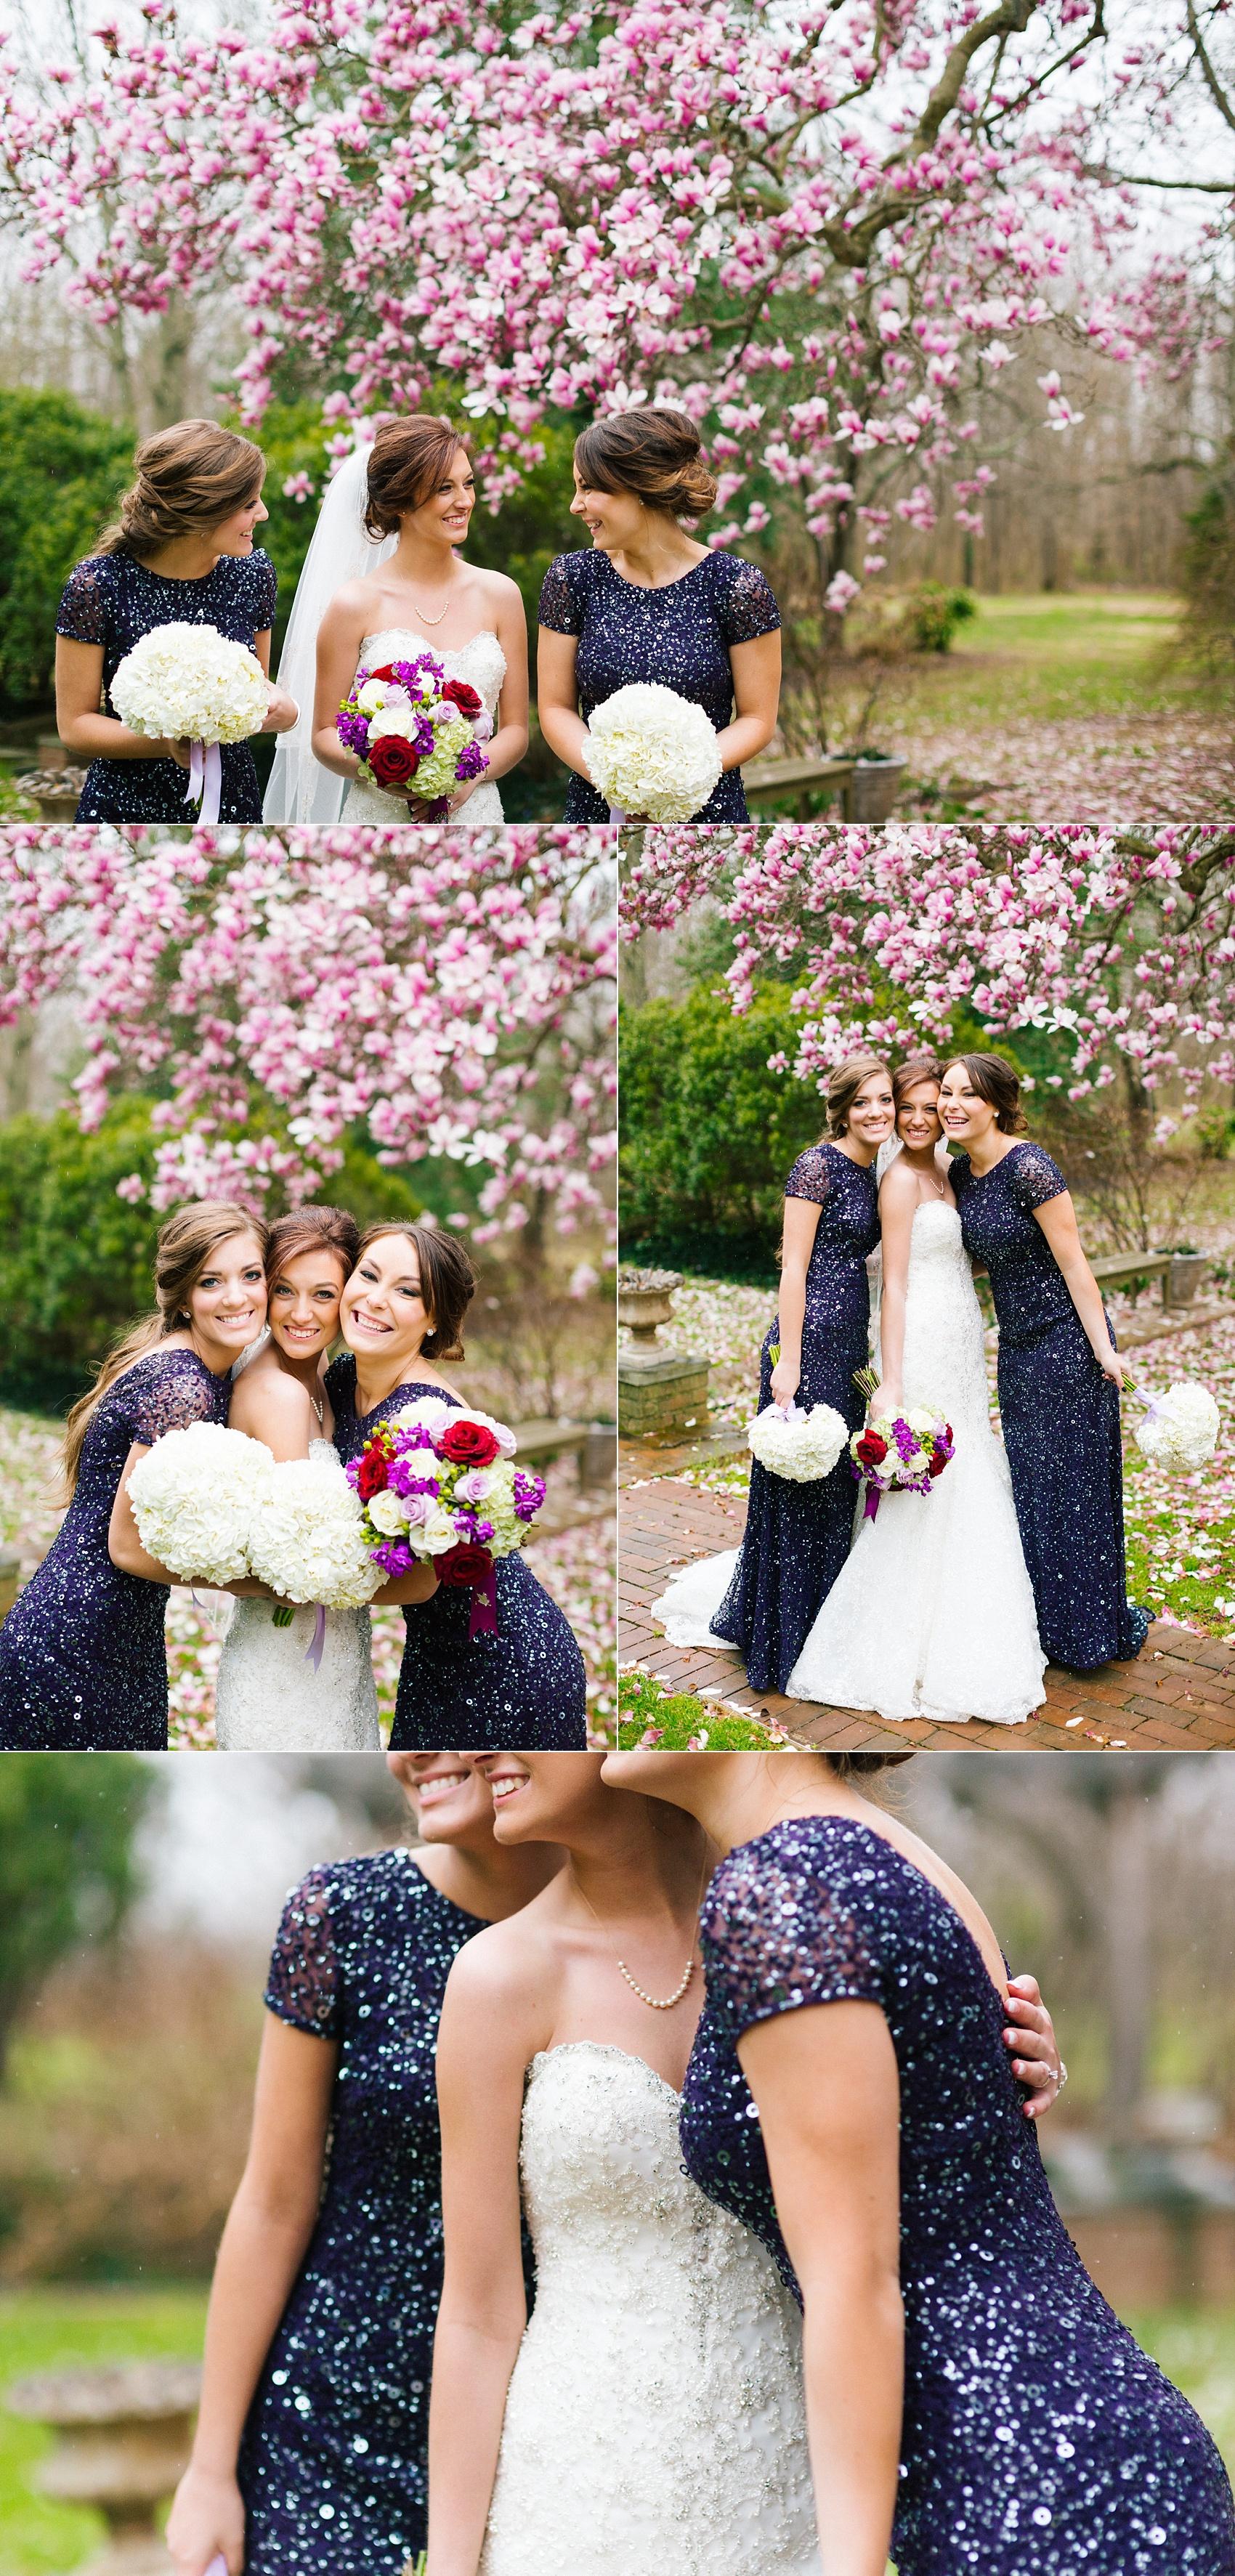 dwayne lydia delaware wedding philadelphia baltimore washingtion dc wedding photographer-19